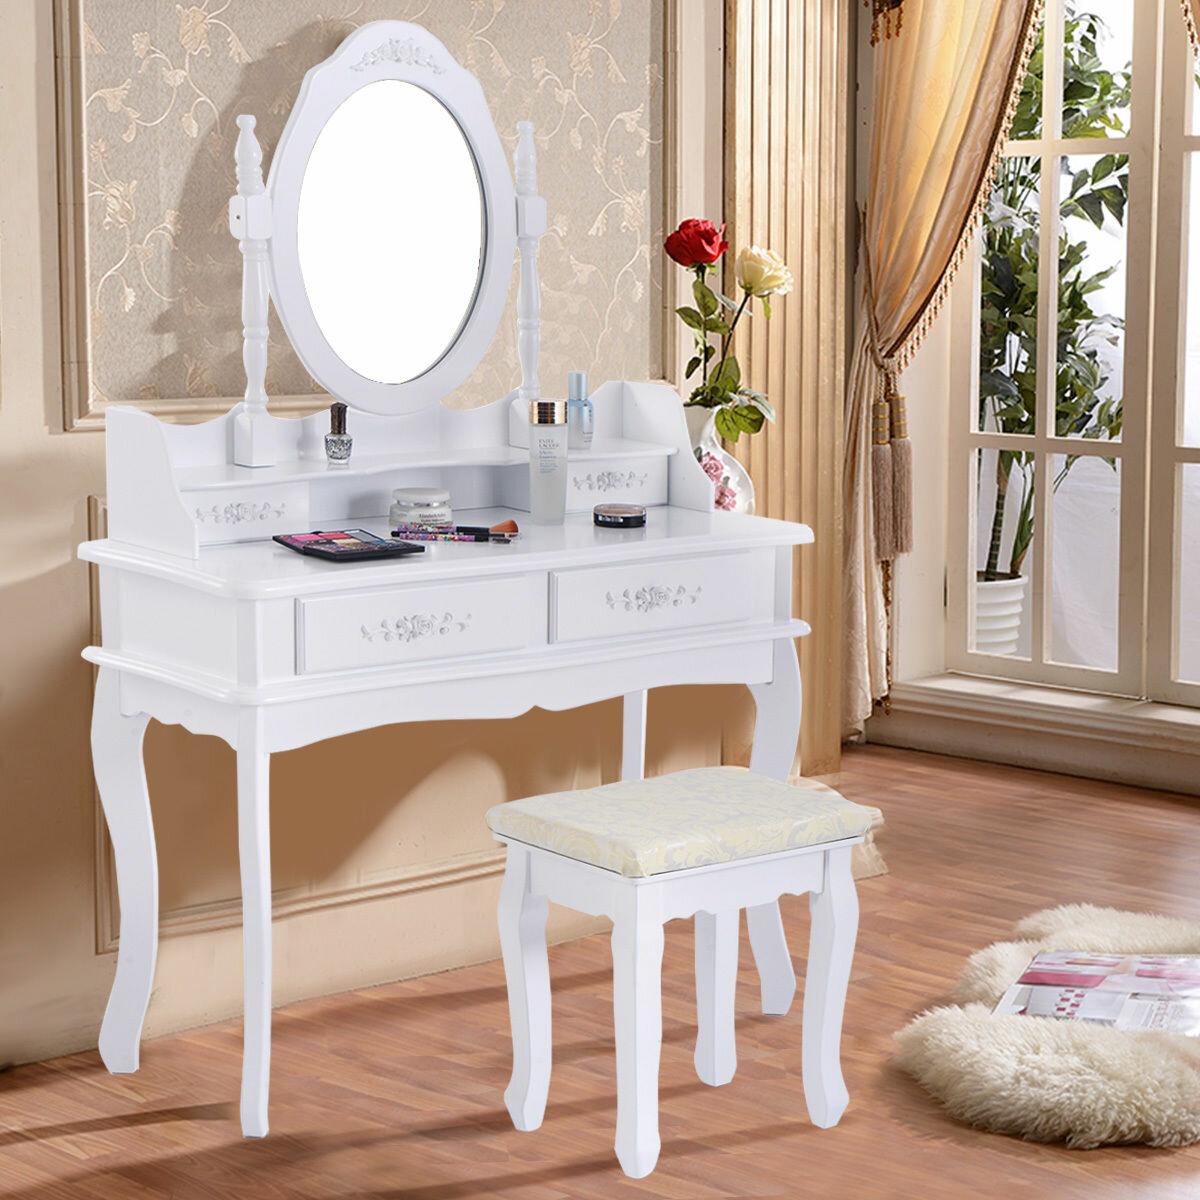 Charlton Home Costway White Vanity Makeup Dressing Table Set Mirror Jewellery Storage W Stool 4 Drawer Reviews Wayfair Ca